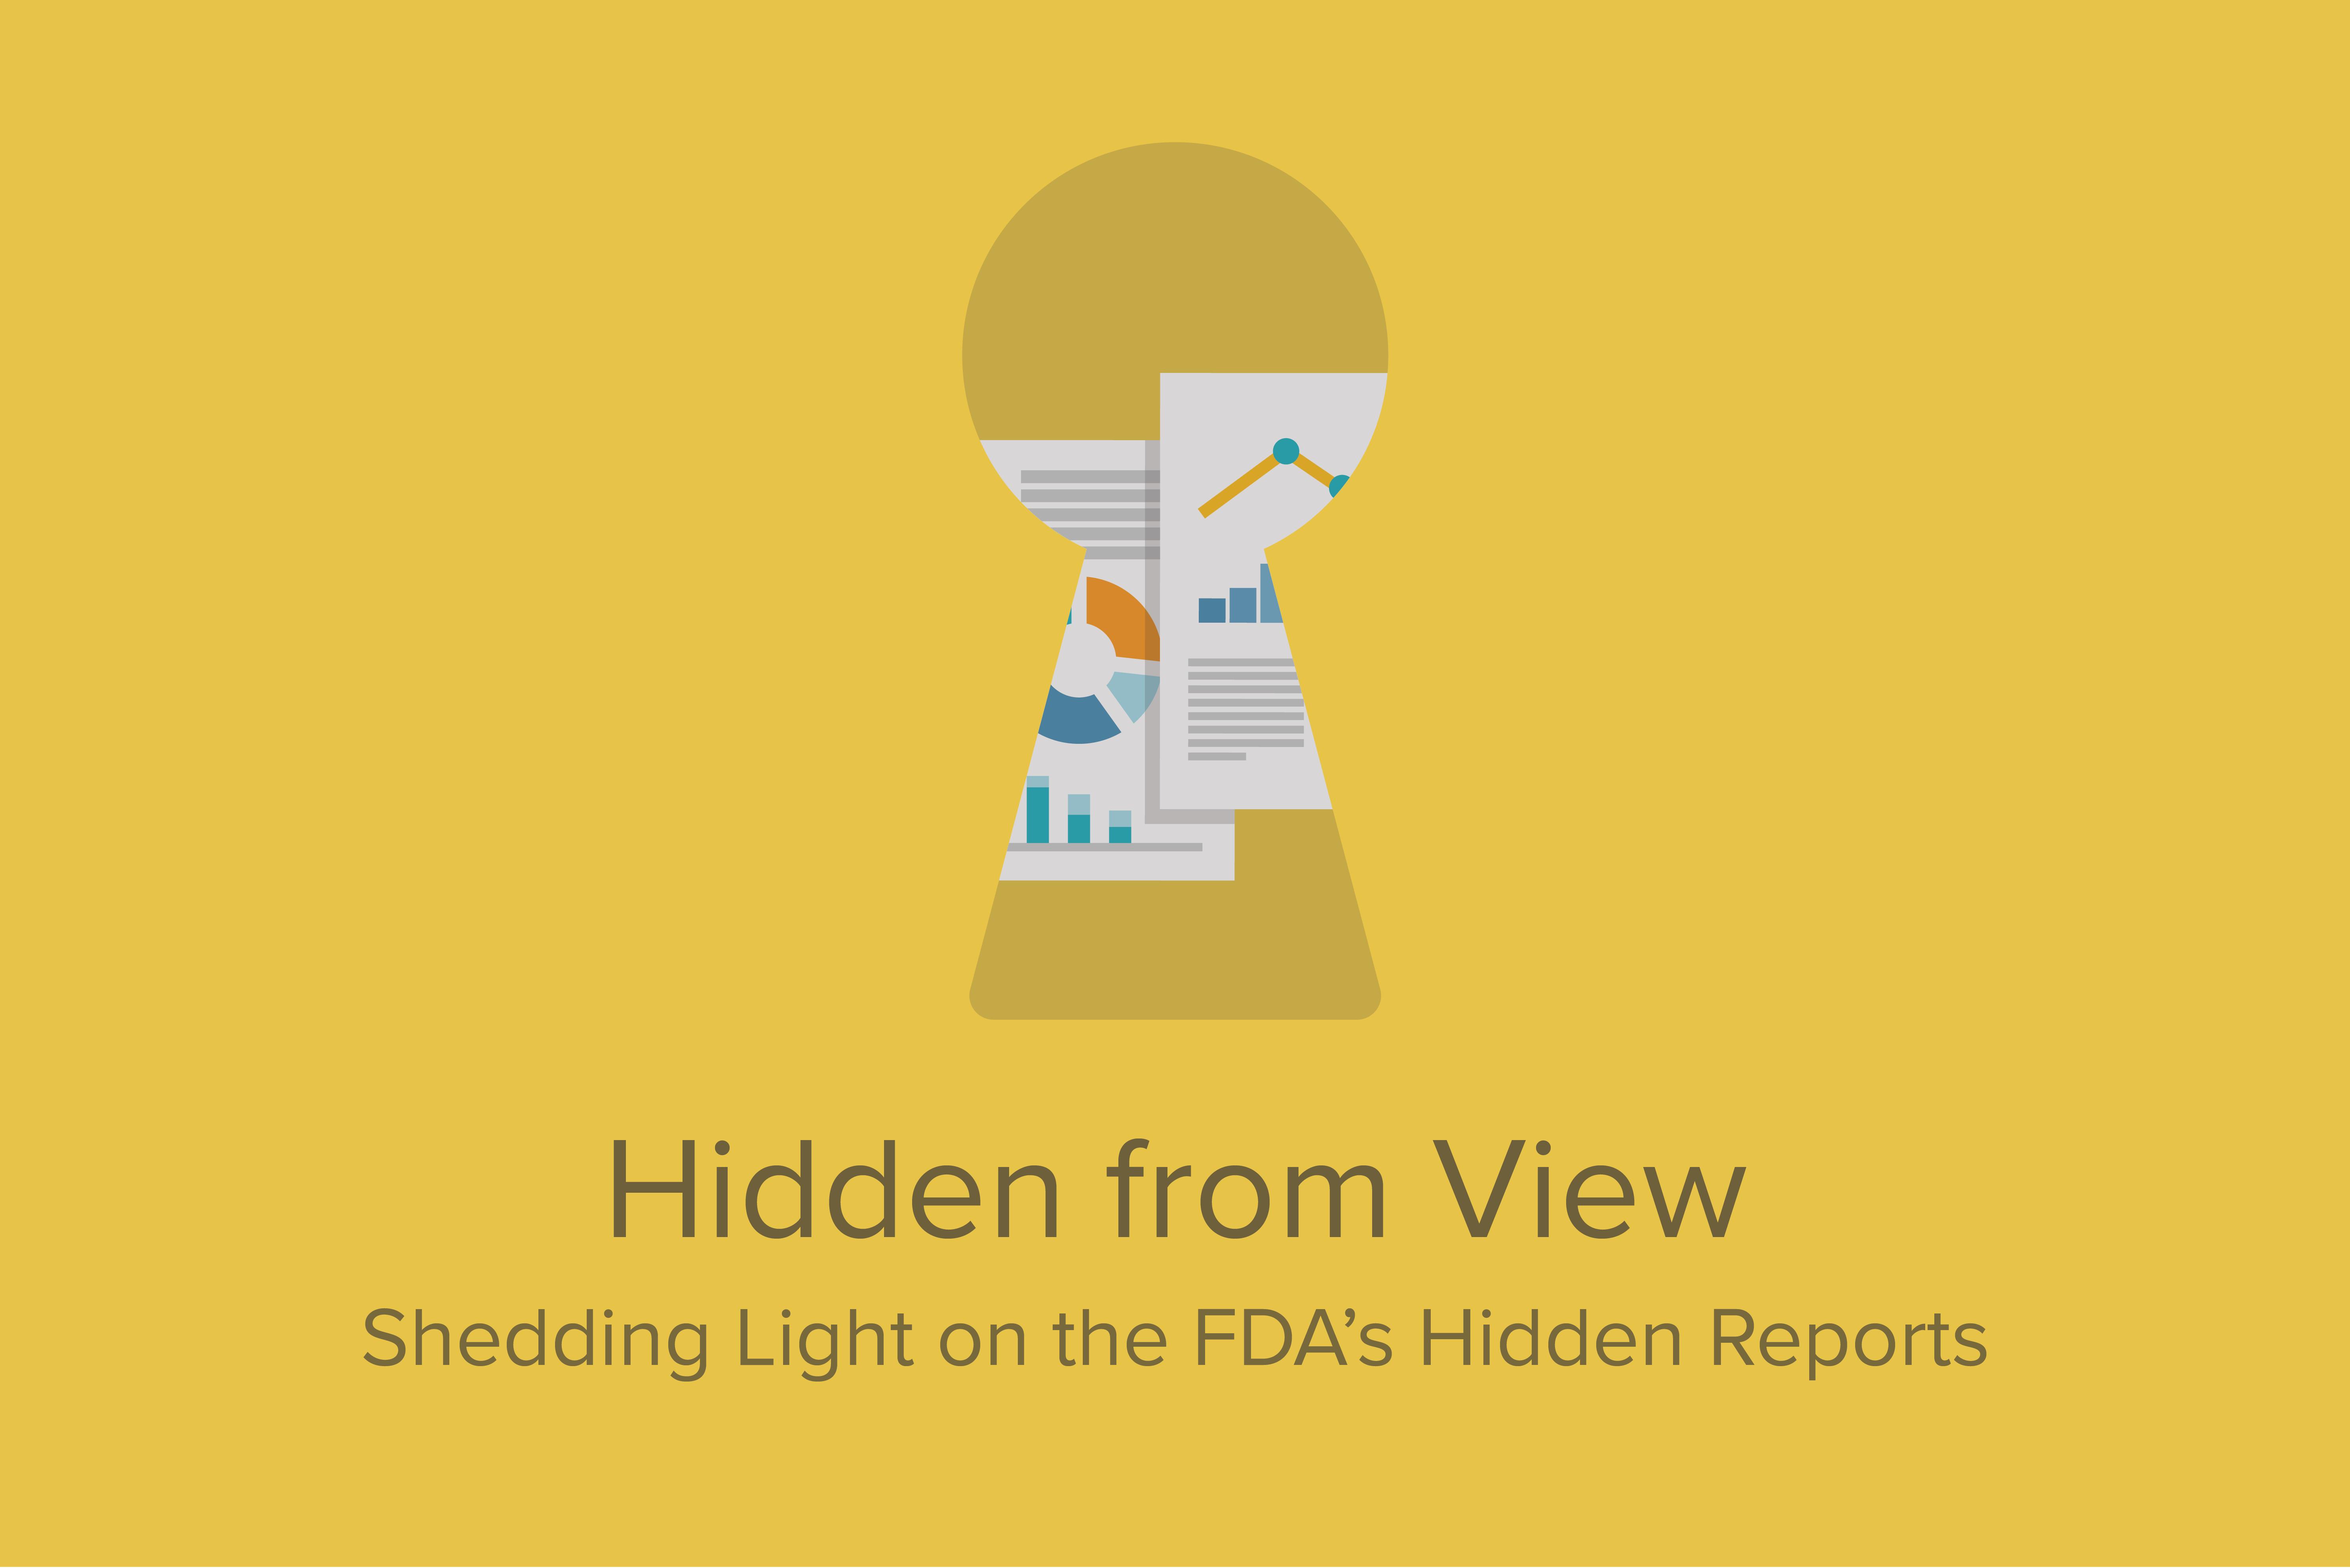 Shedding light on the FDA's hidden reports